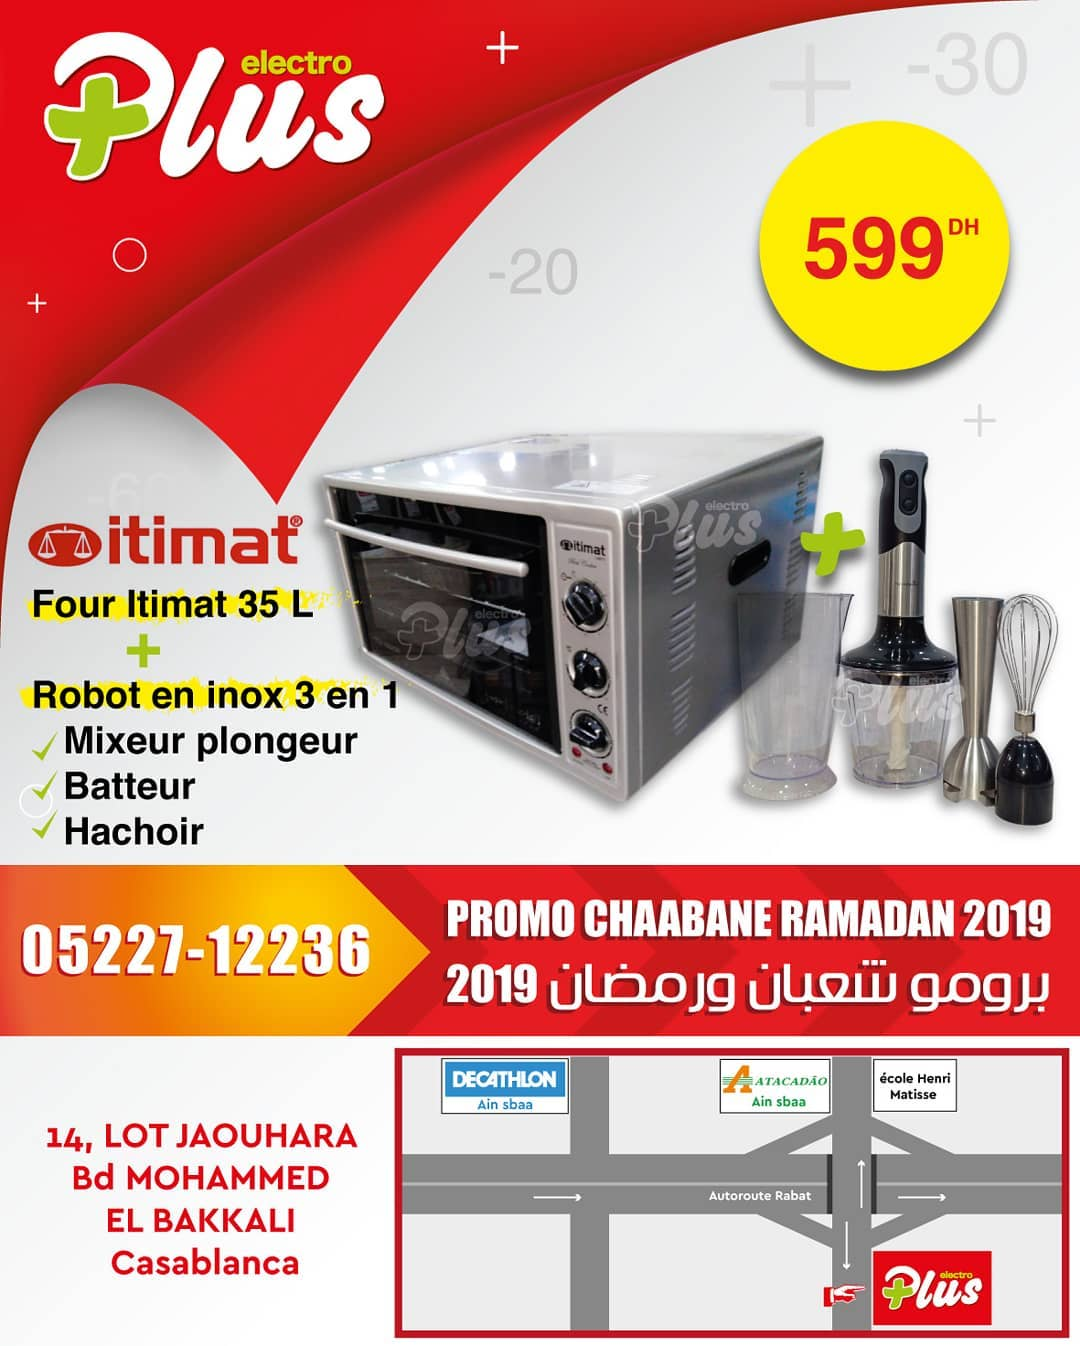 Promo Electroplus Four Itimat 35L + Robot inox 3en1 599Dhs